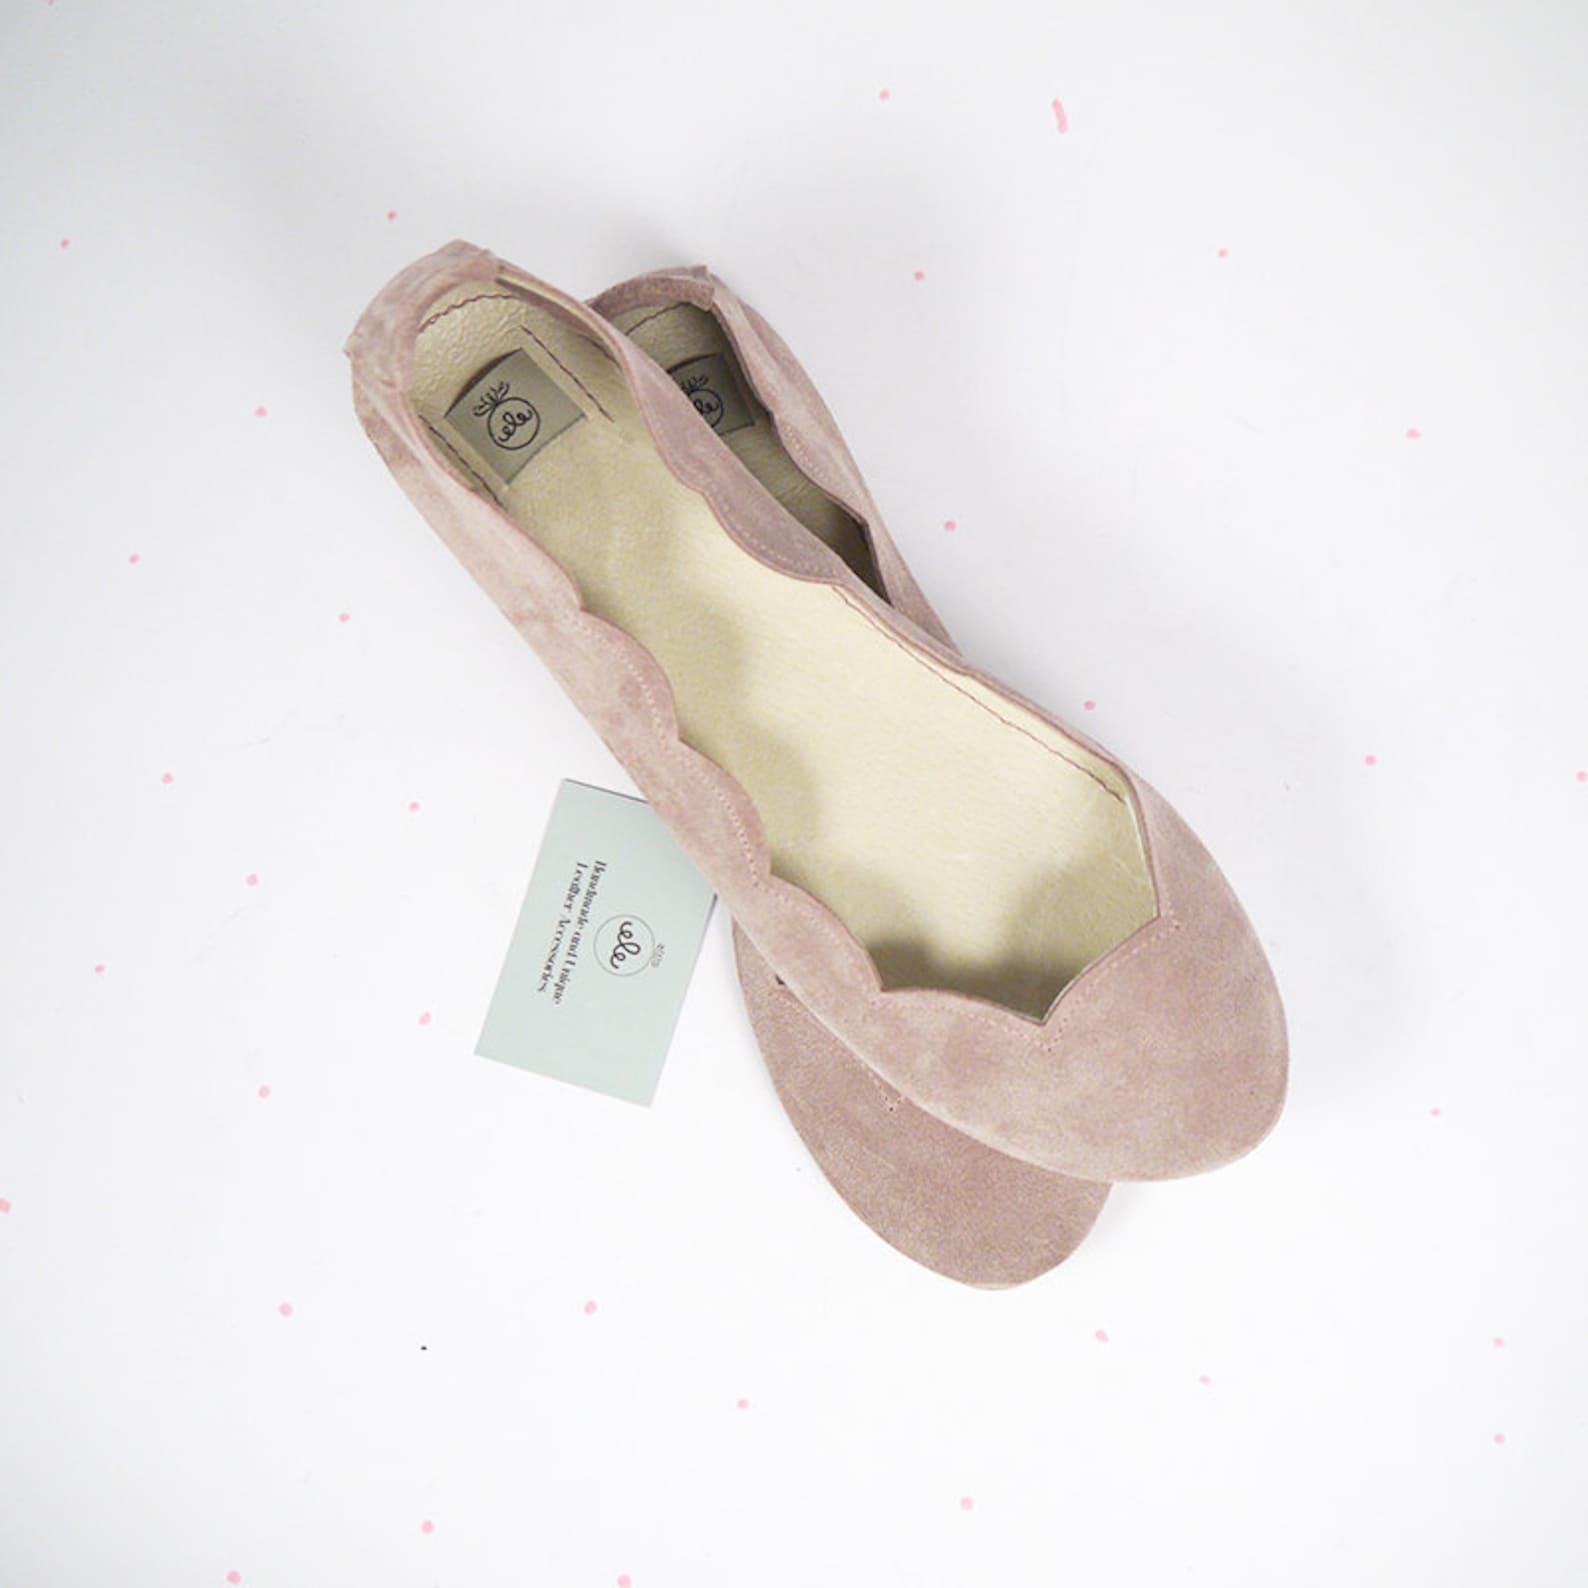 ballet flats shoes. bridal shoes. wedding ballet flats. rose smoke shoes. rose gold wedding. low heel shoes. brautschuhe. chauss